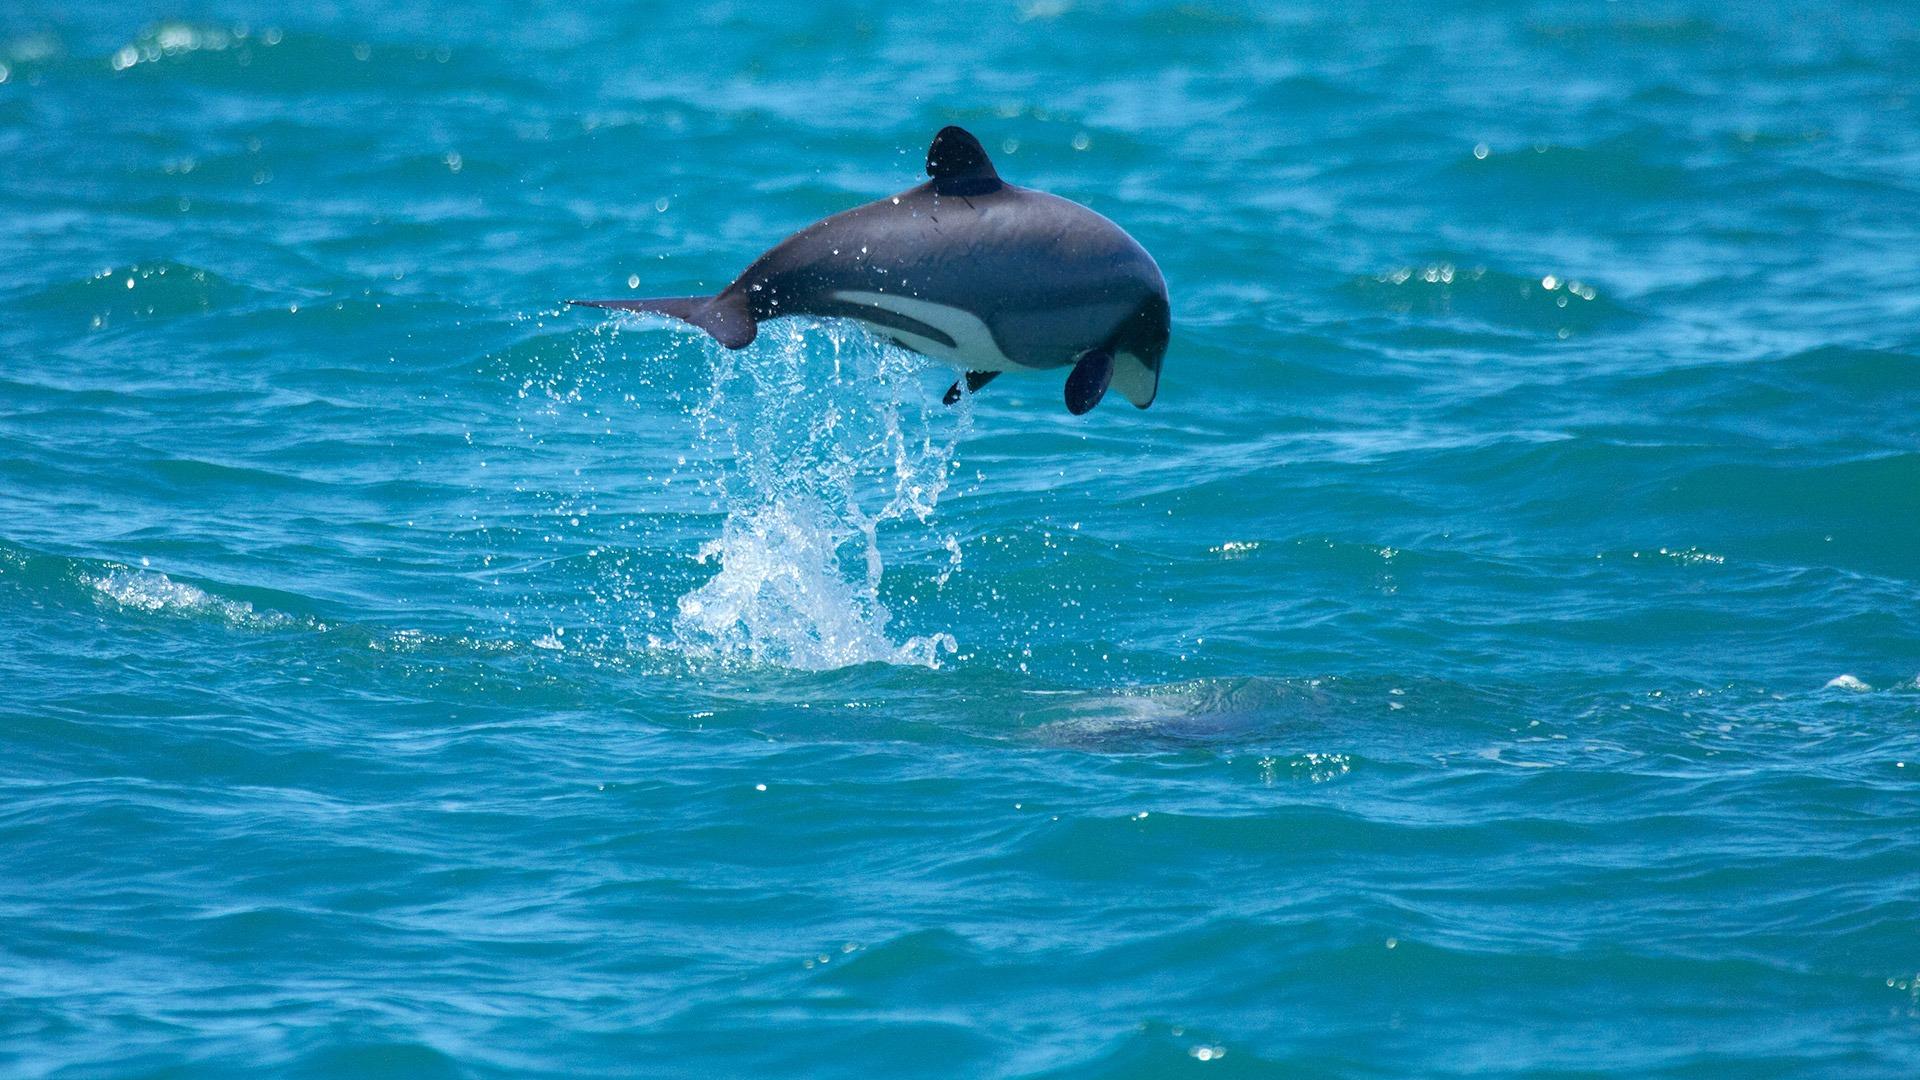 Hector's dolphin jumping, Akaroa Harbour, Banks Peninsula, New Zealand